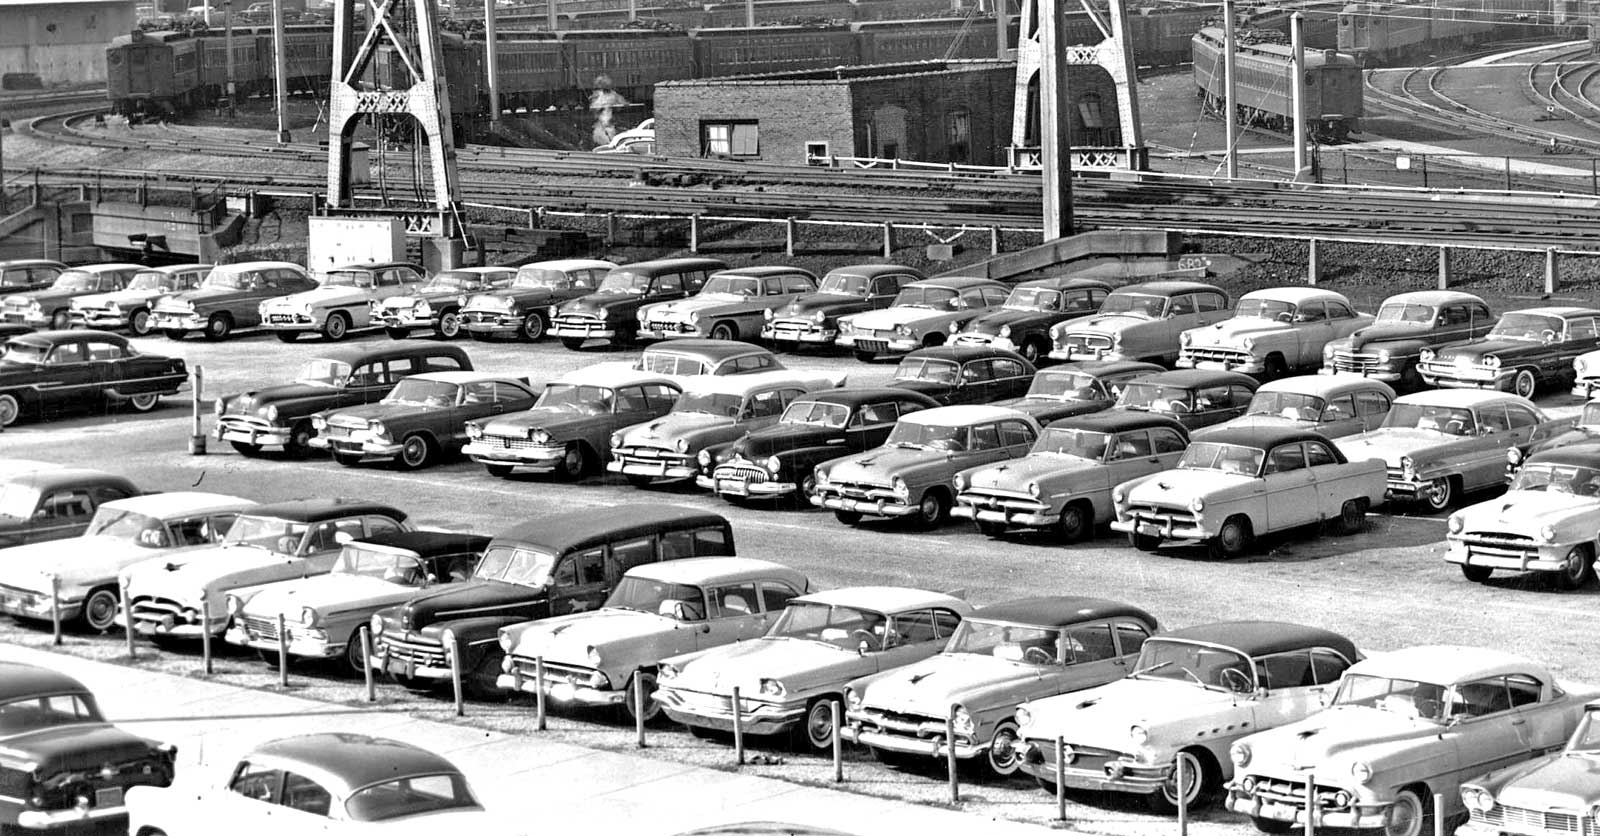 Parking Lot Series The Philadelphia Bulletin Newspaper